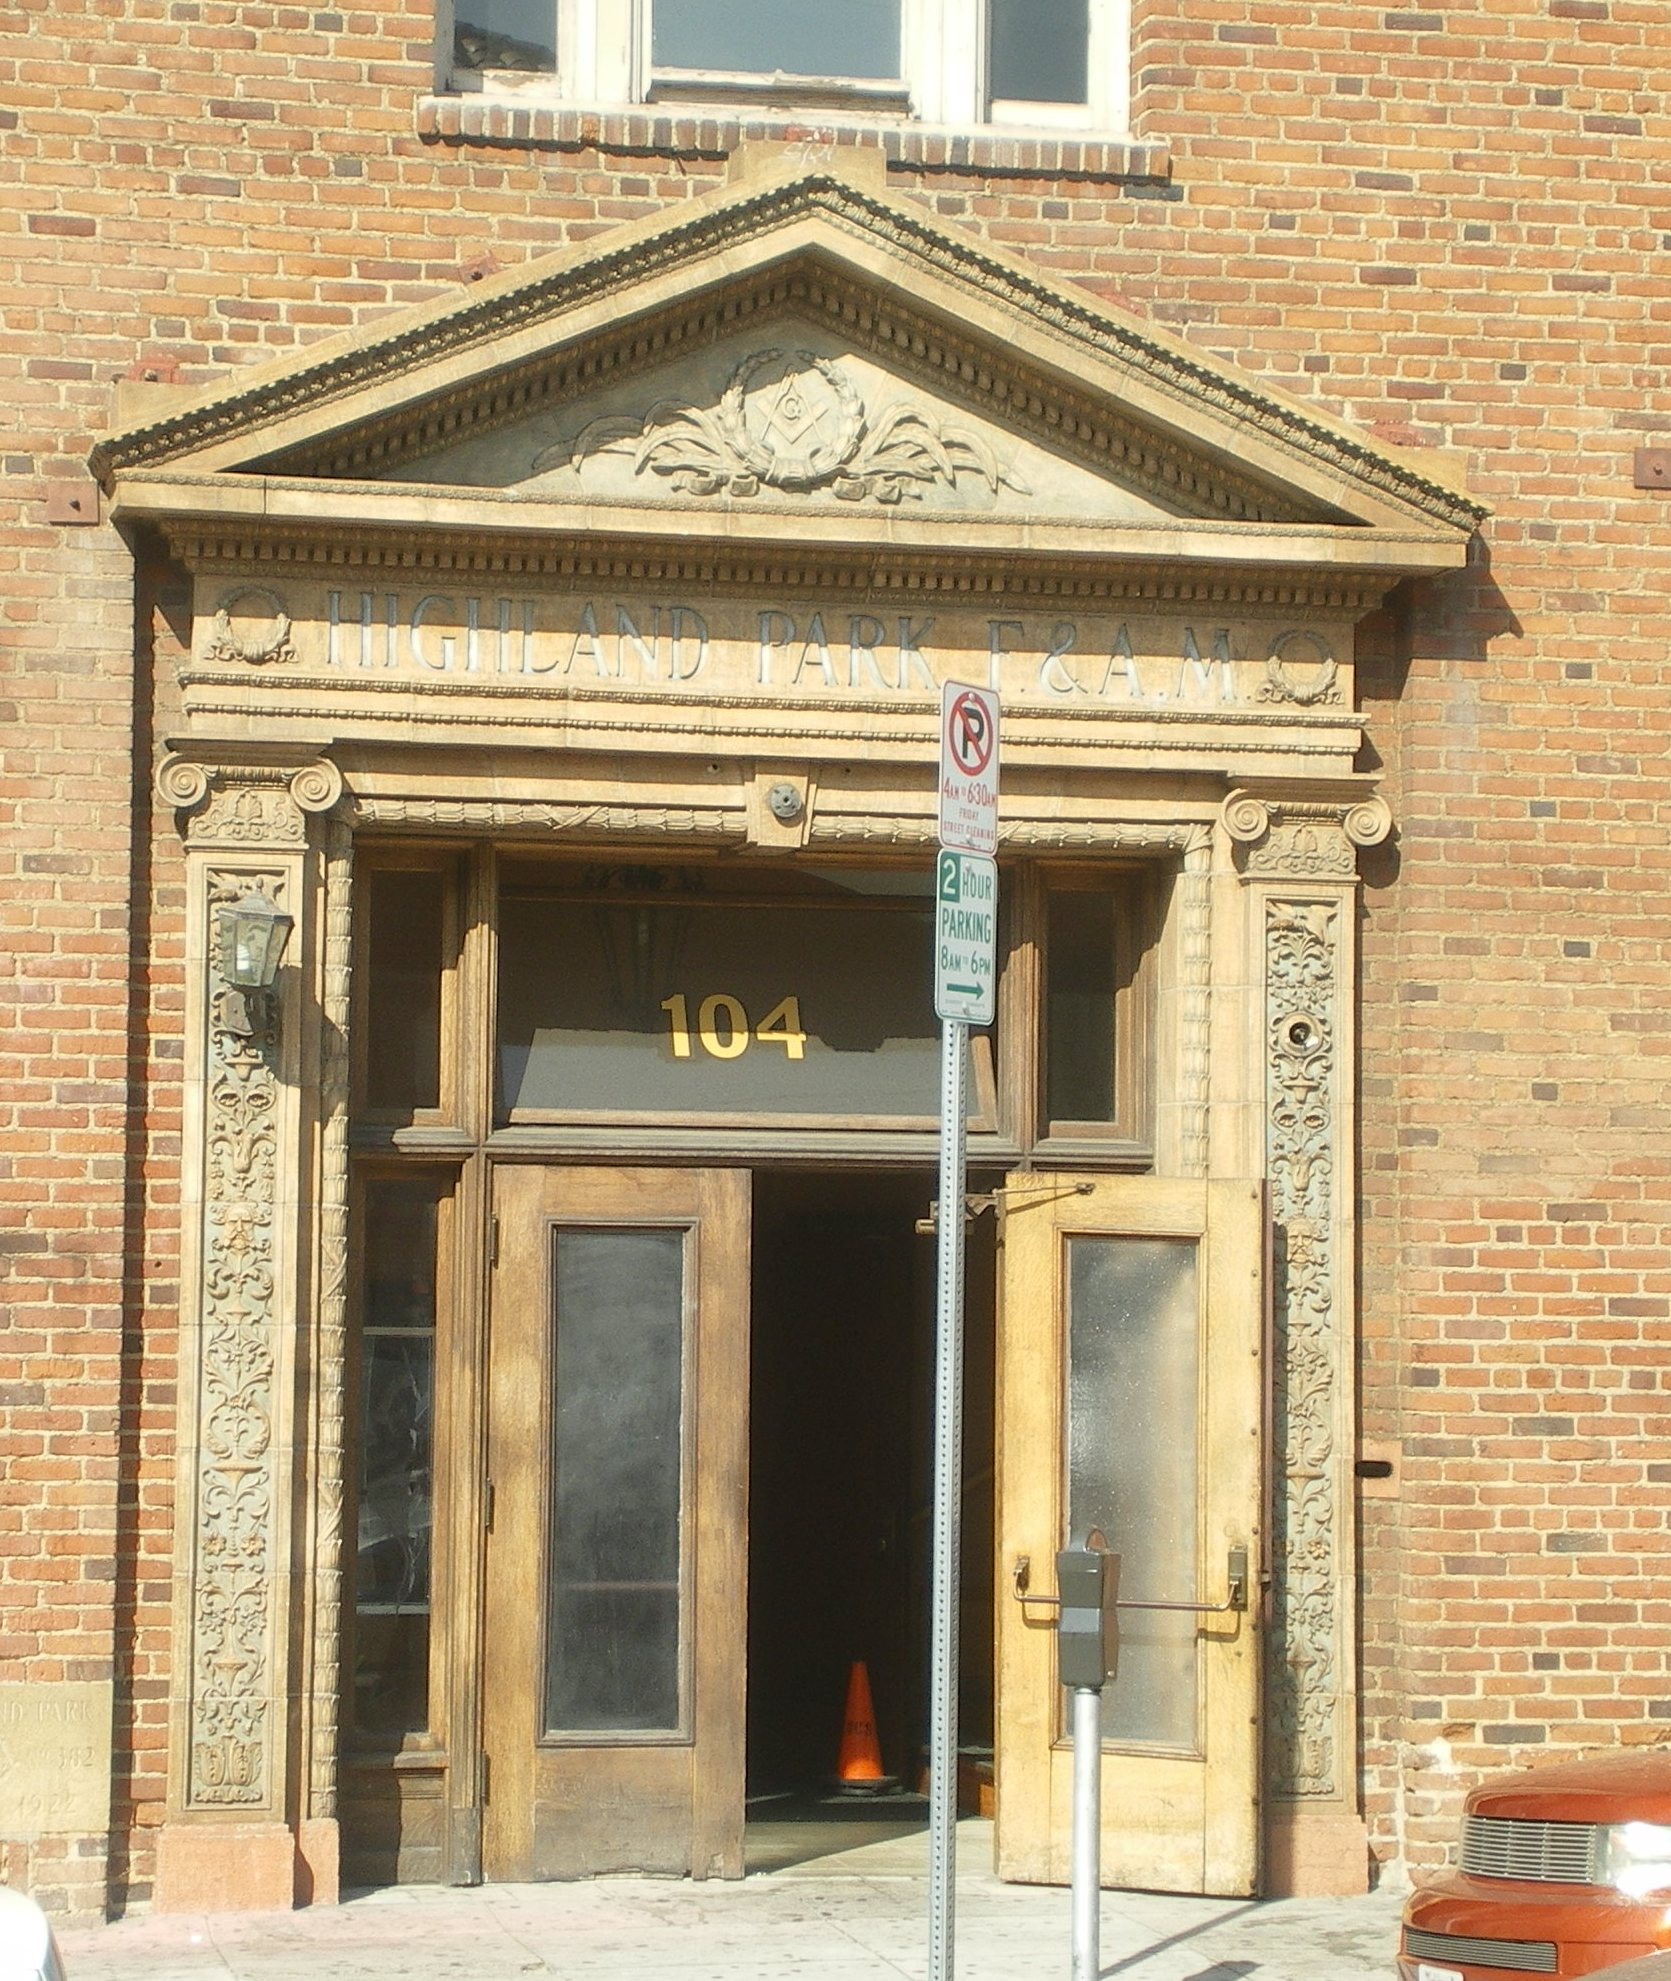 Masonic Temple Building Denver Colorado: File:Highland Park Masonic Temple, Main Entrance.jpg